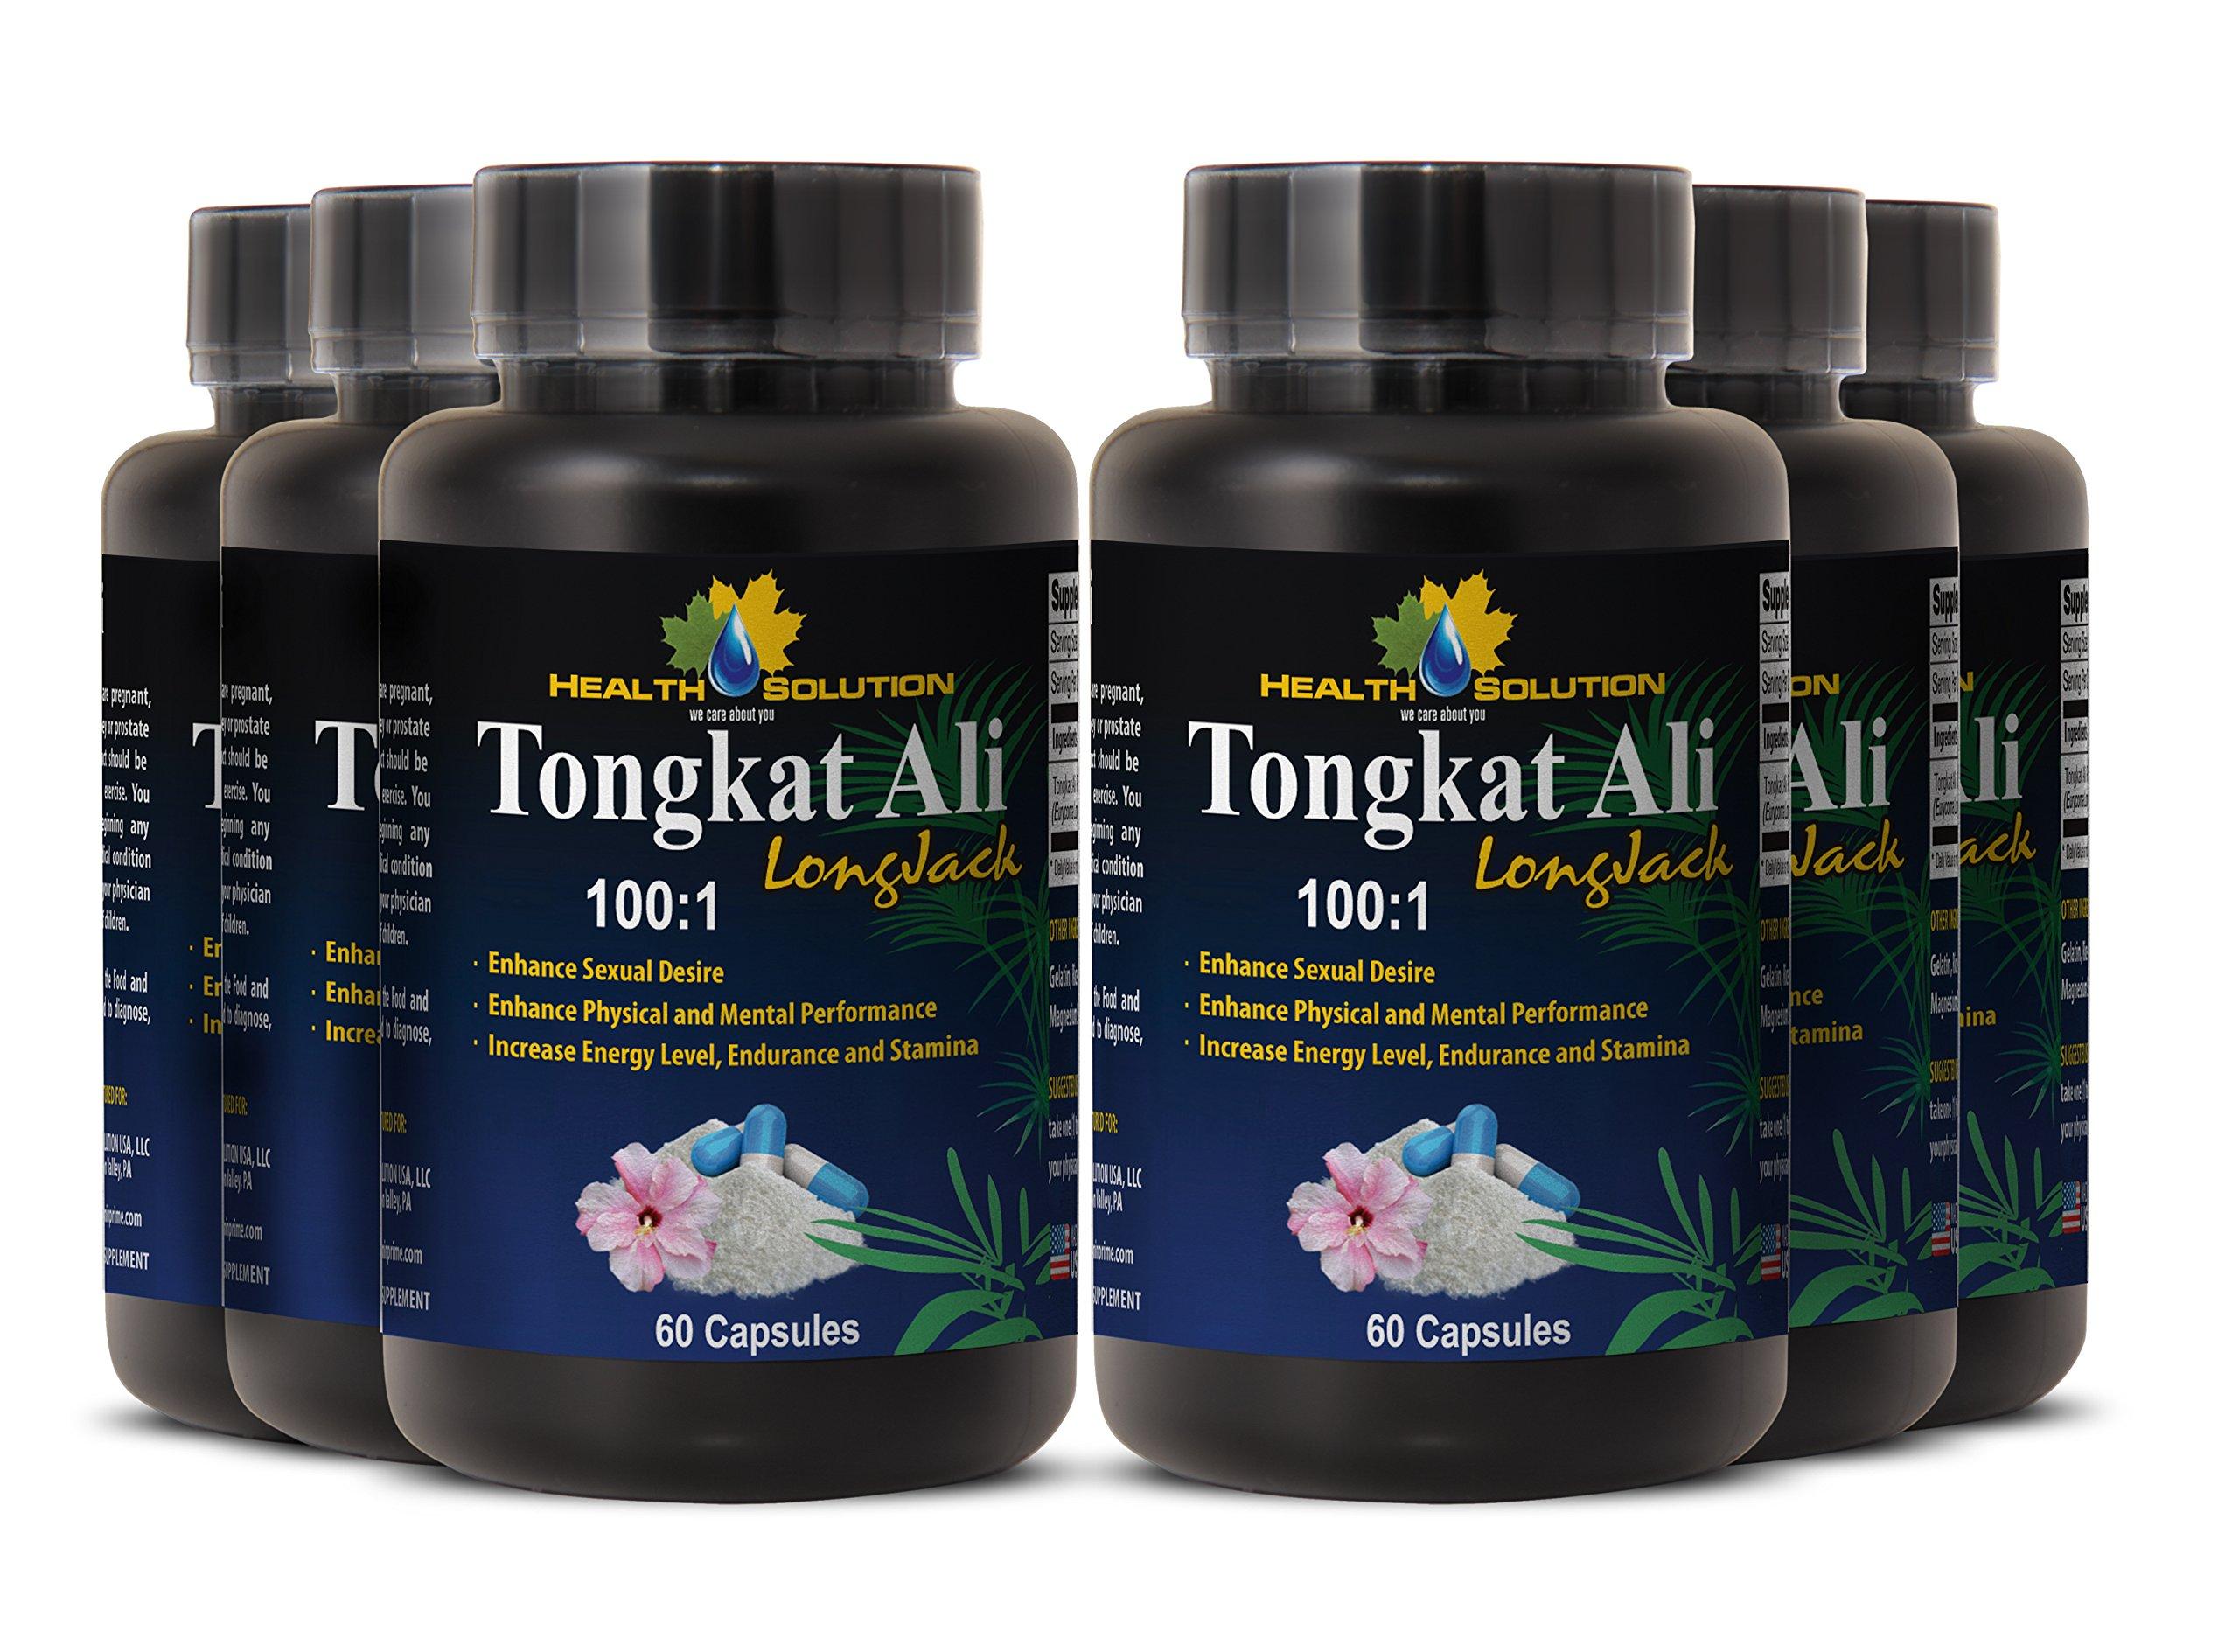 Tongkat ali bulk - TONGKAT ALI ROOT EXTRACT 100 : 1 400MG - improve muscle mass and strength (6 Bottles)